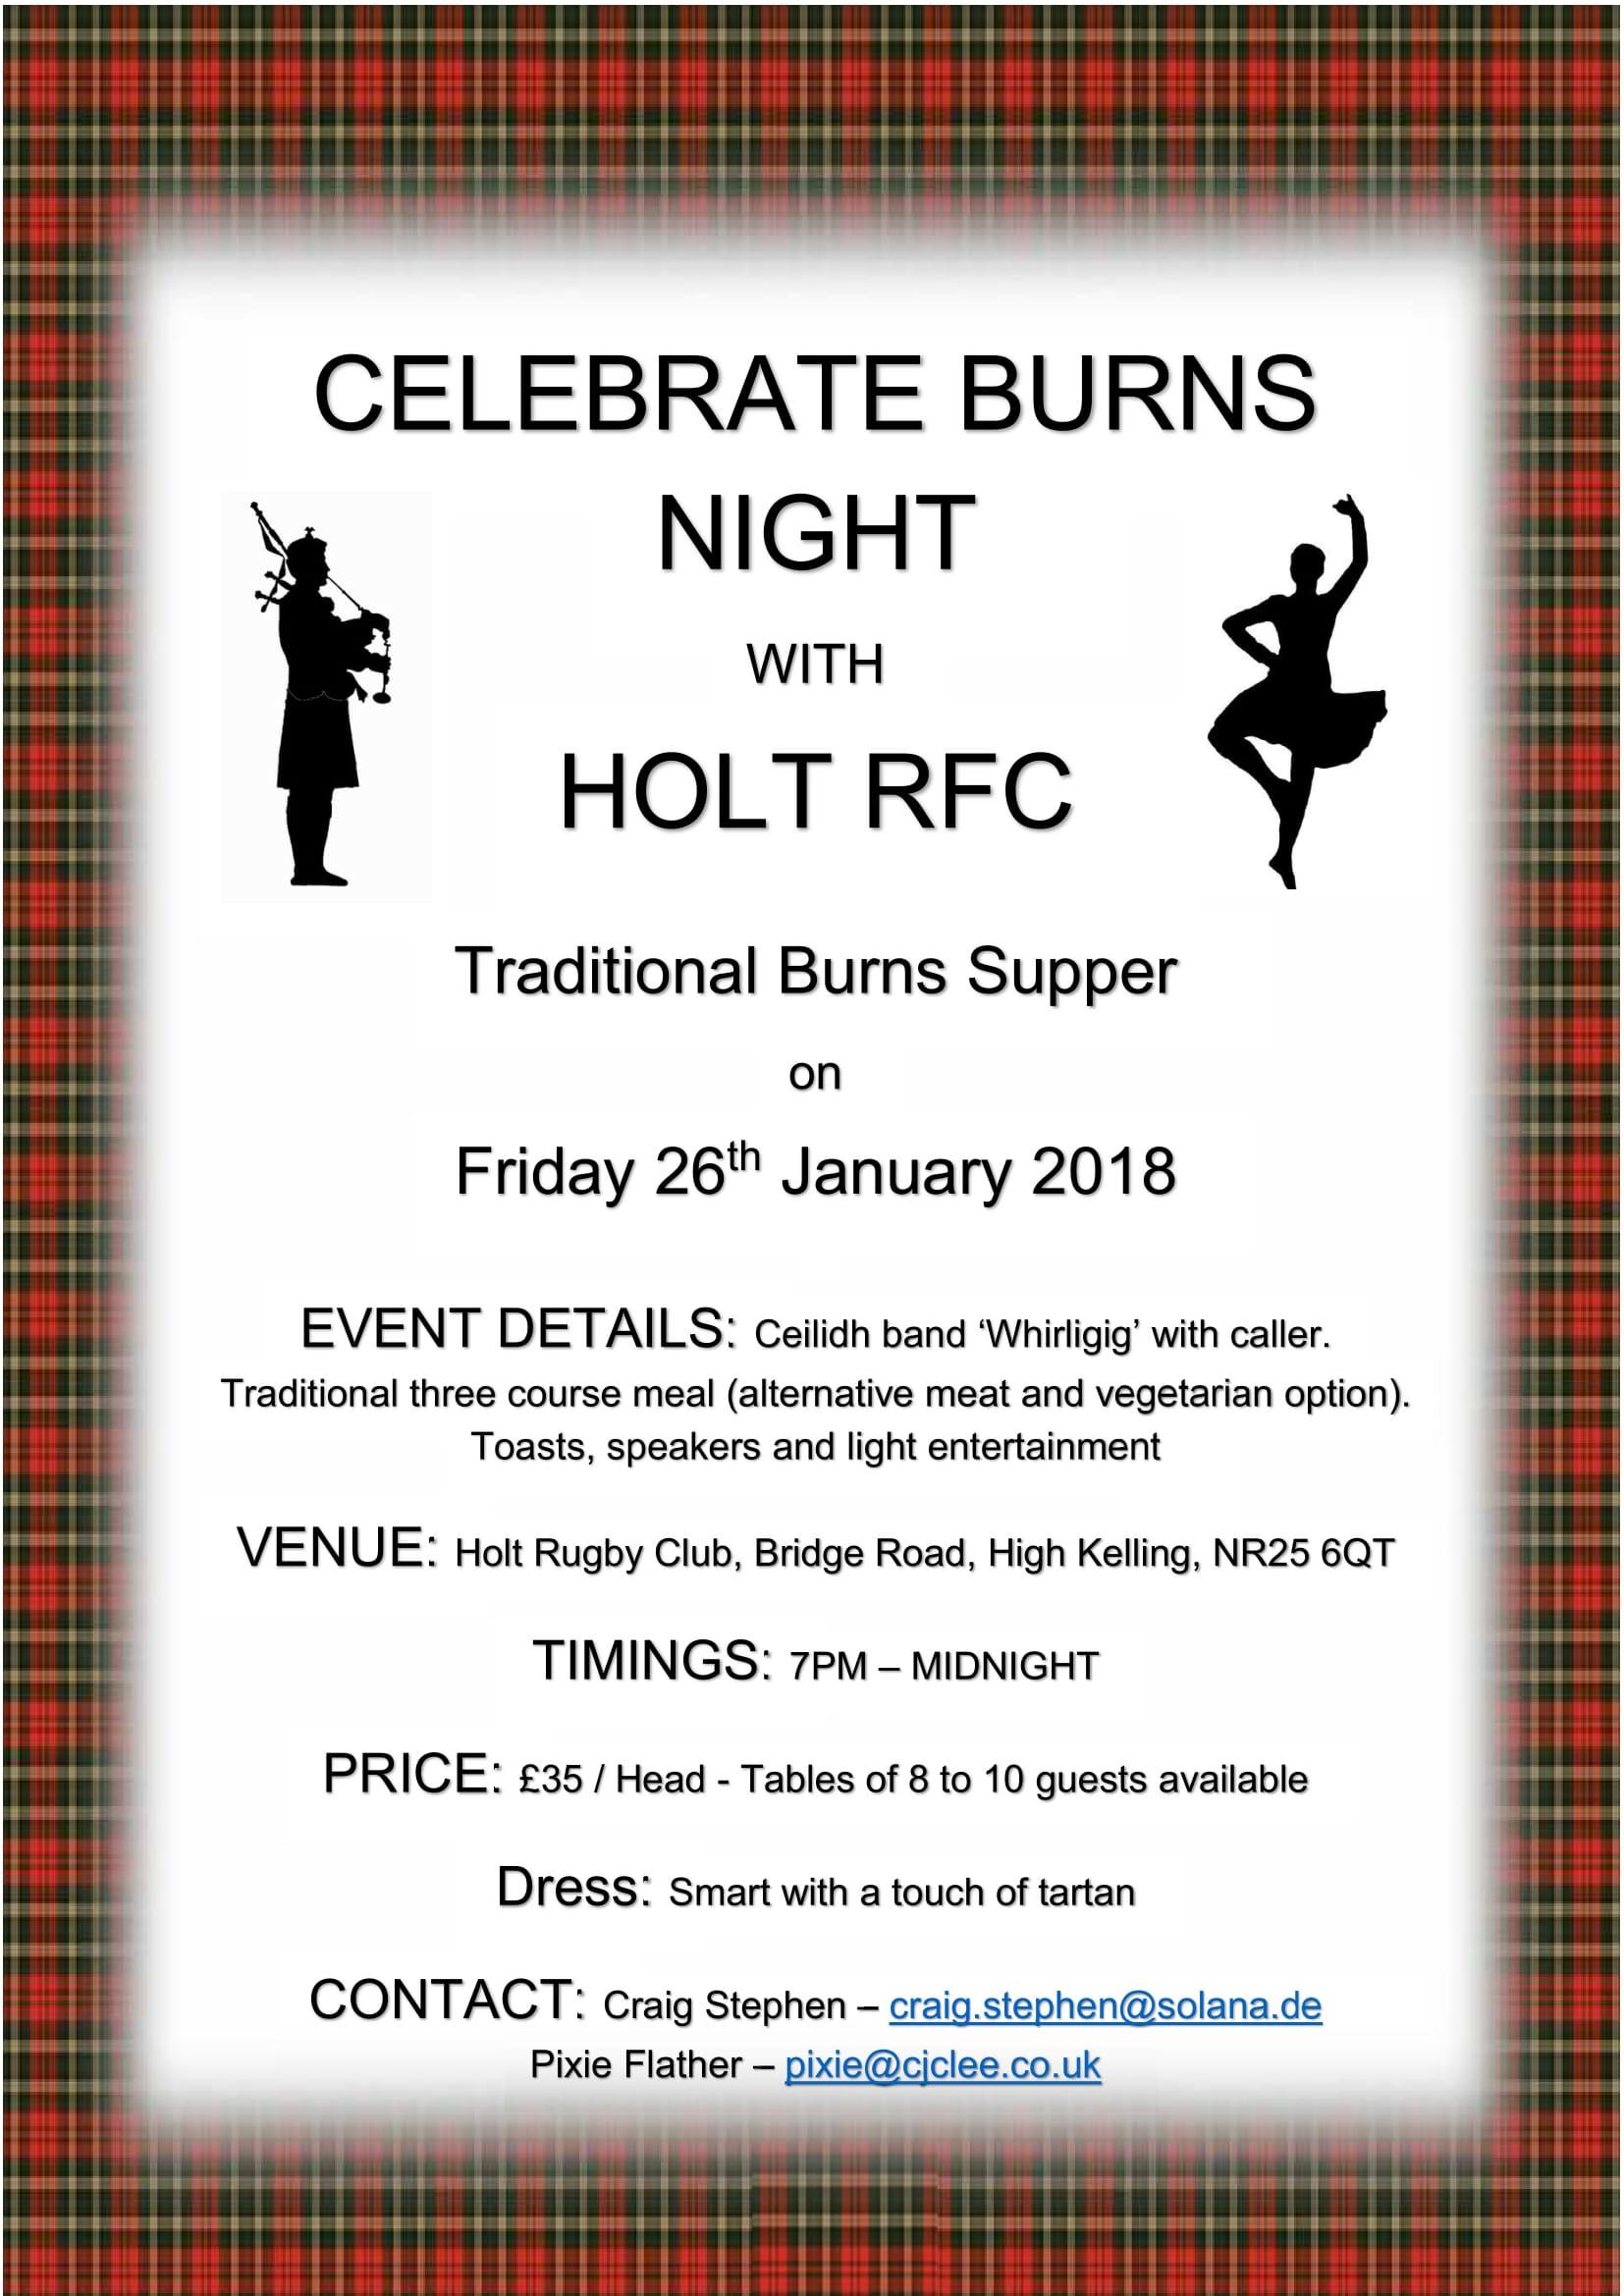 Celebrate Burns Night with Holt RFC Holt Rugby Football Club